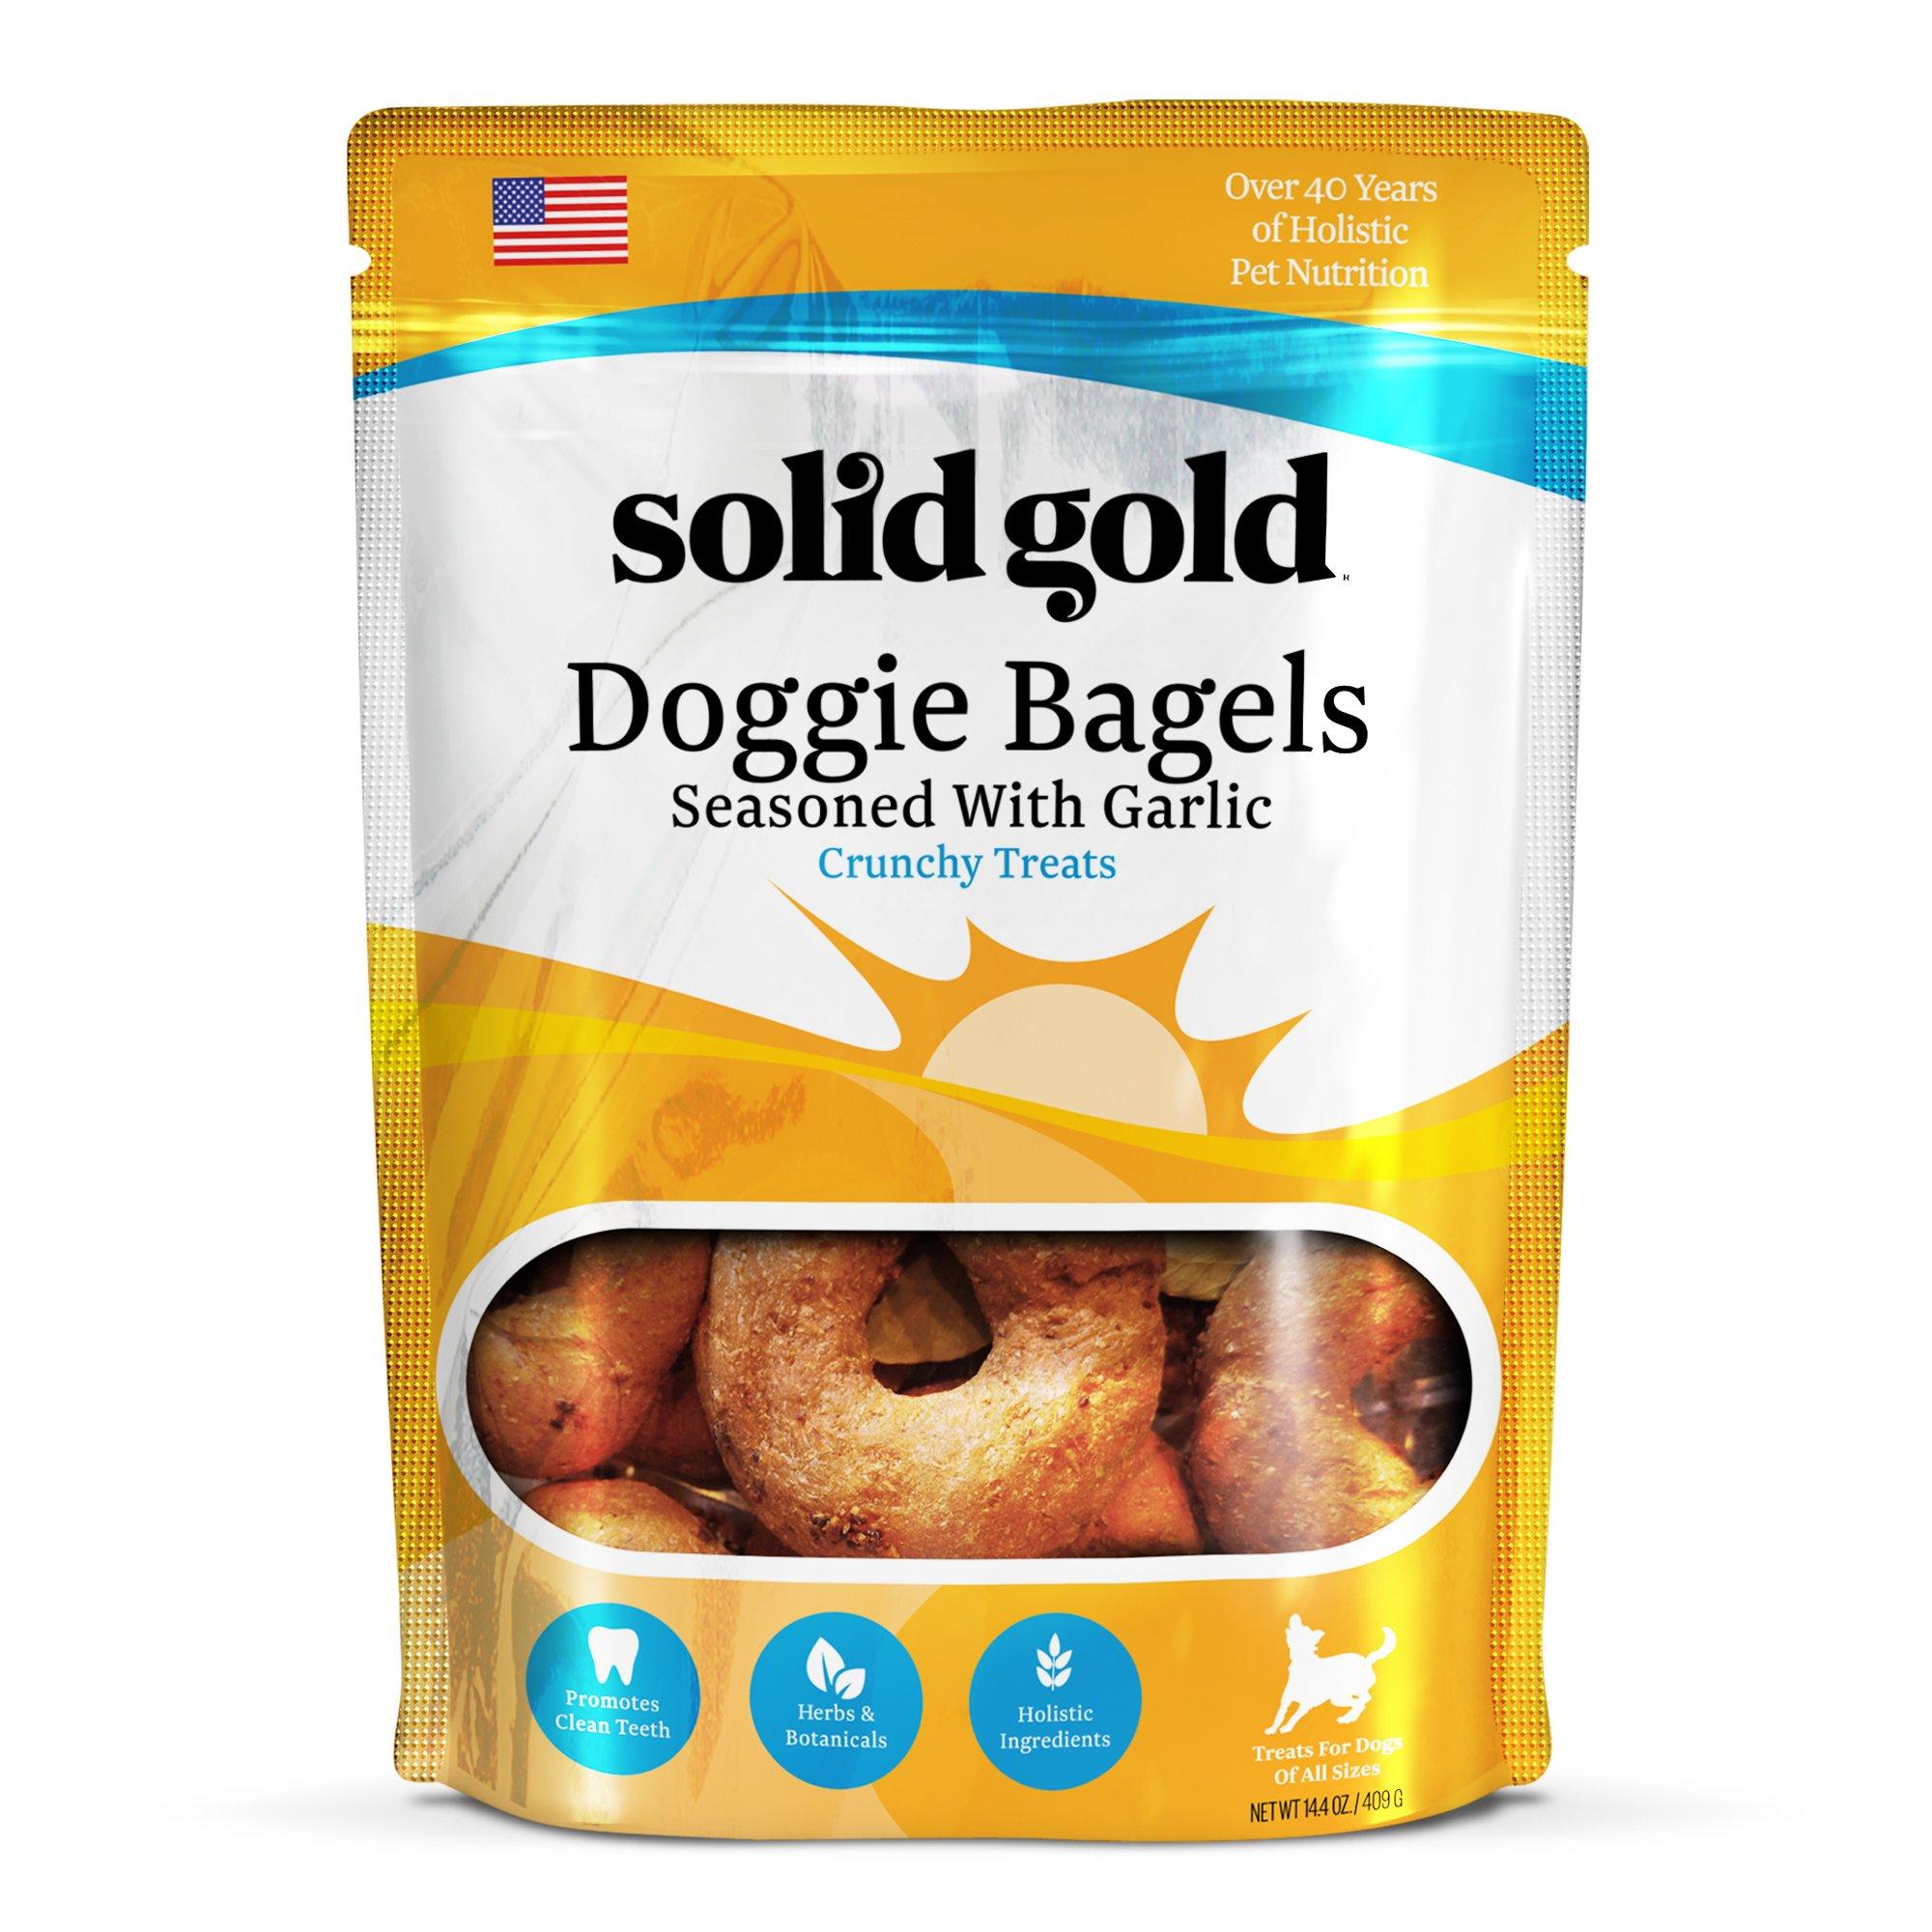 Solid Gold Garlic Doggie Bagels